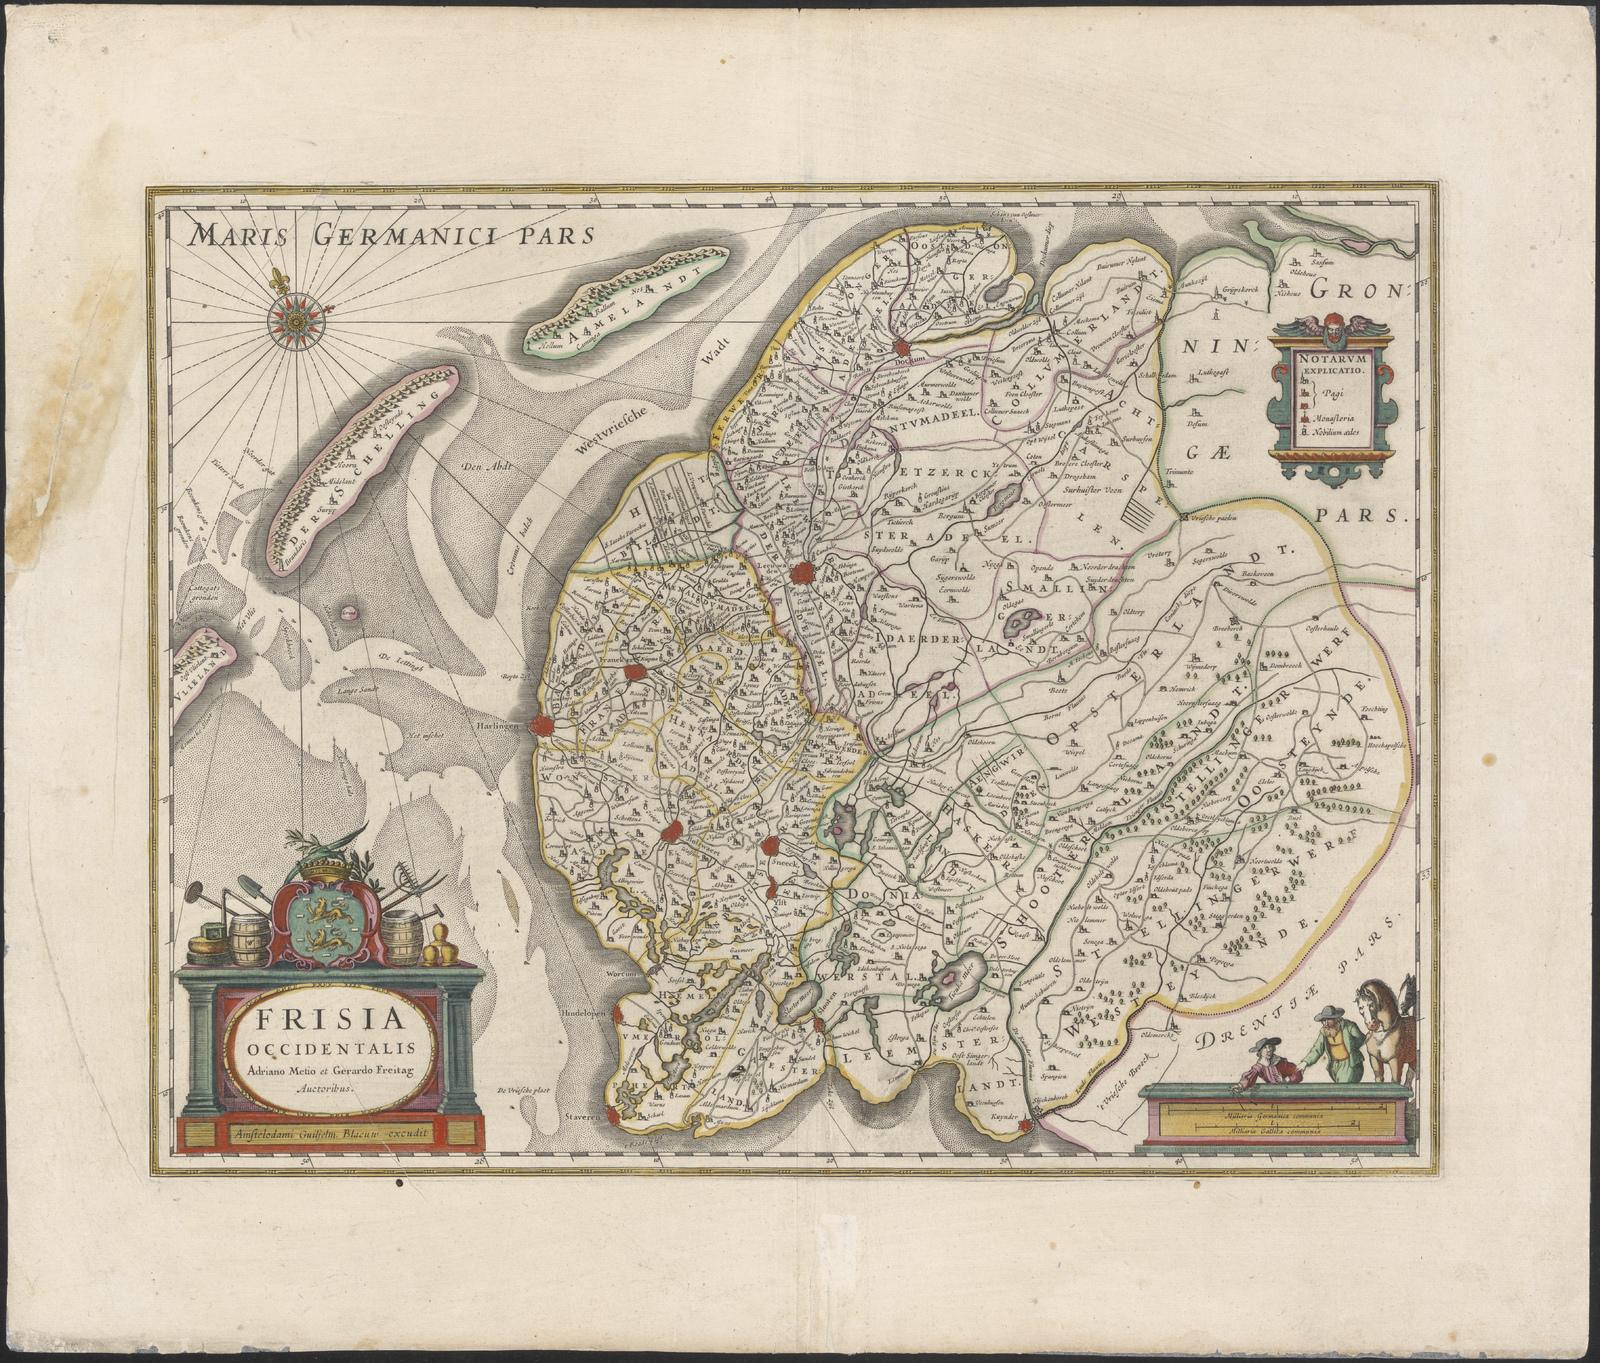 Frisia Occidentalis